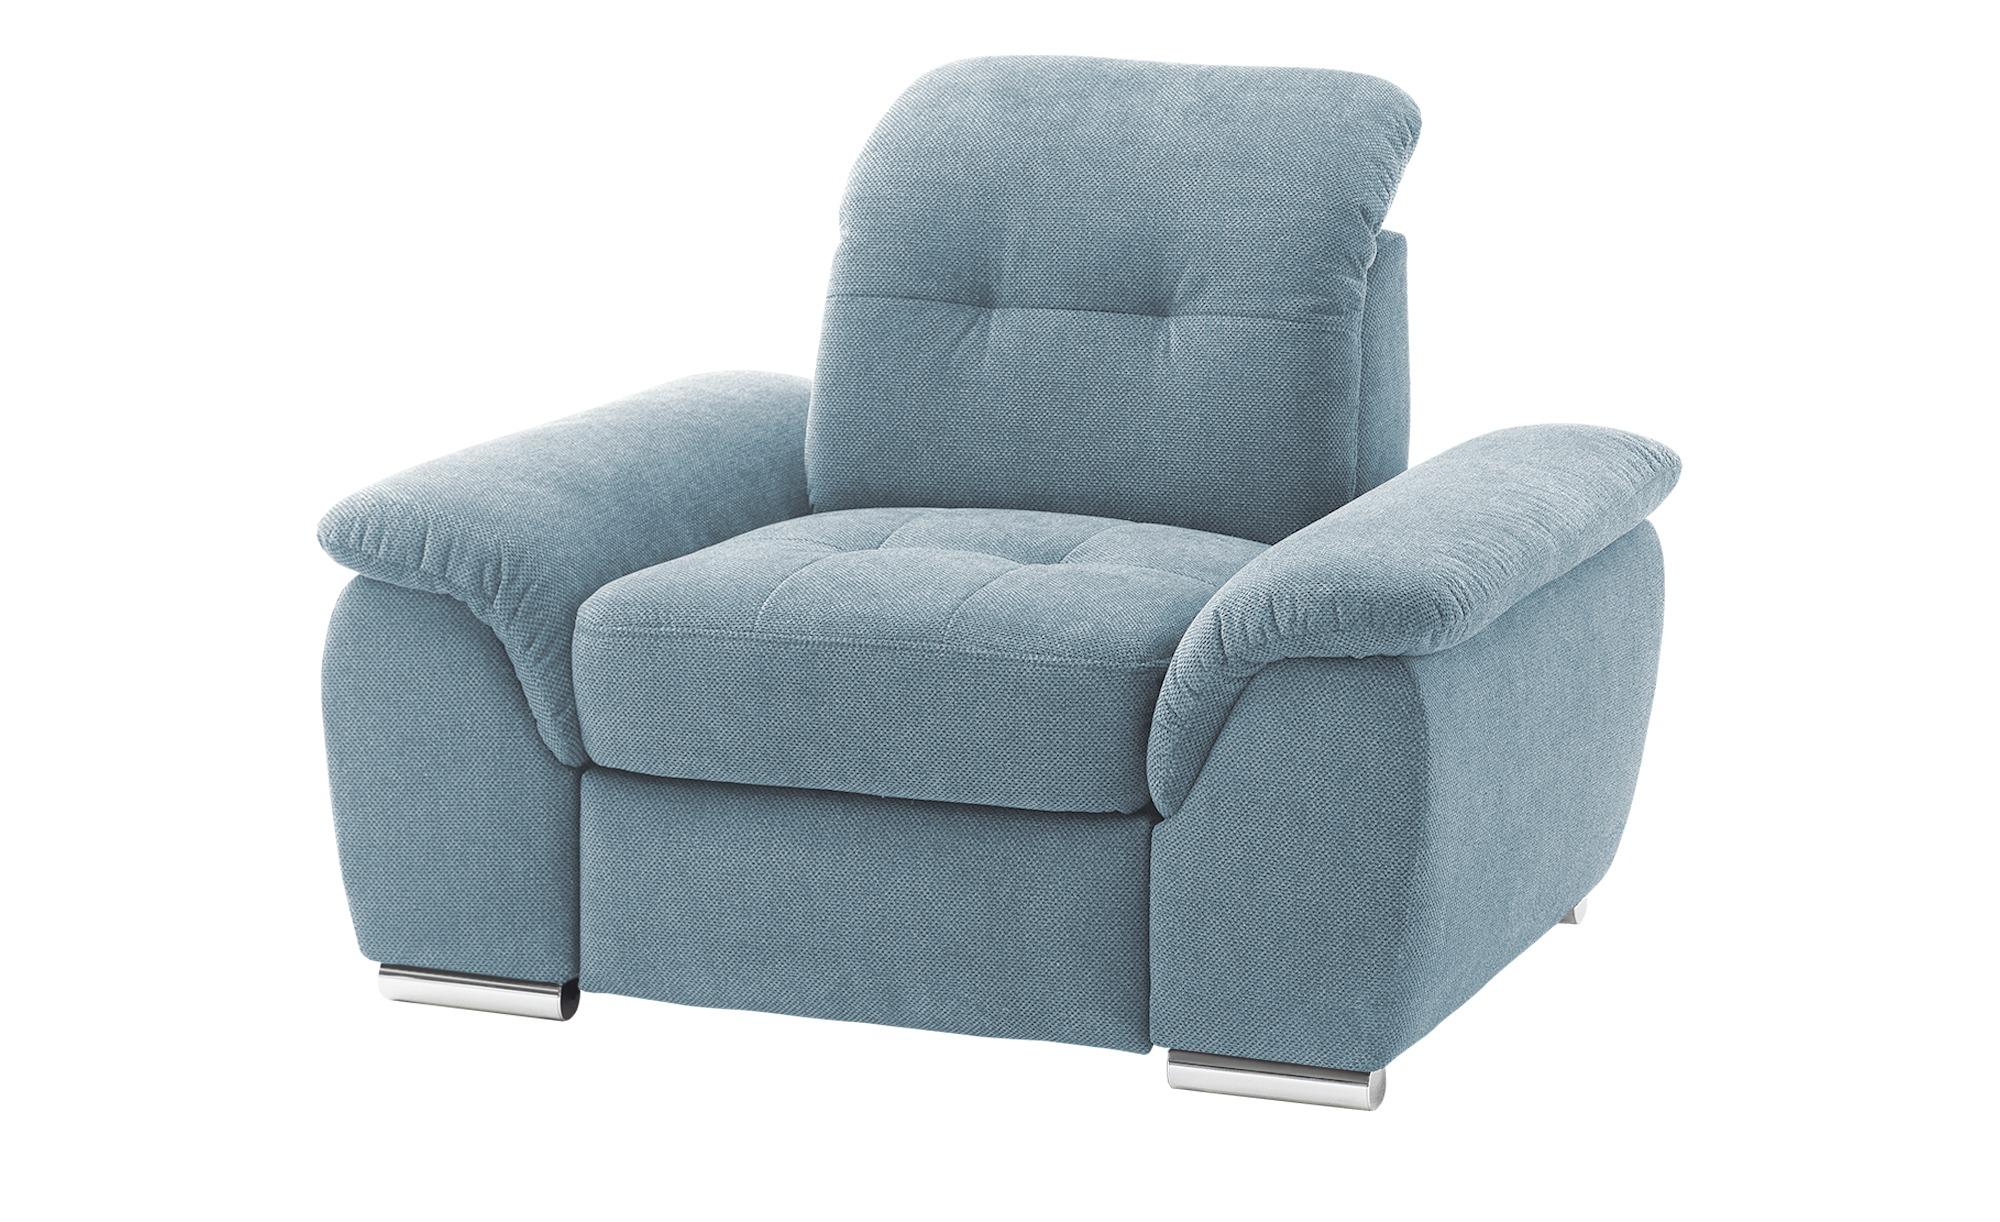 Sessel   Halona ¦ blau ¦ Maße (cm): B: 116 H: 89 T: 109 Polstermöbel > Sessel > Polstersessel - Höffner